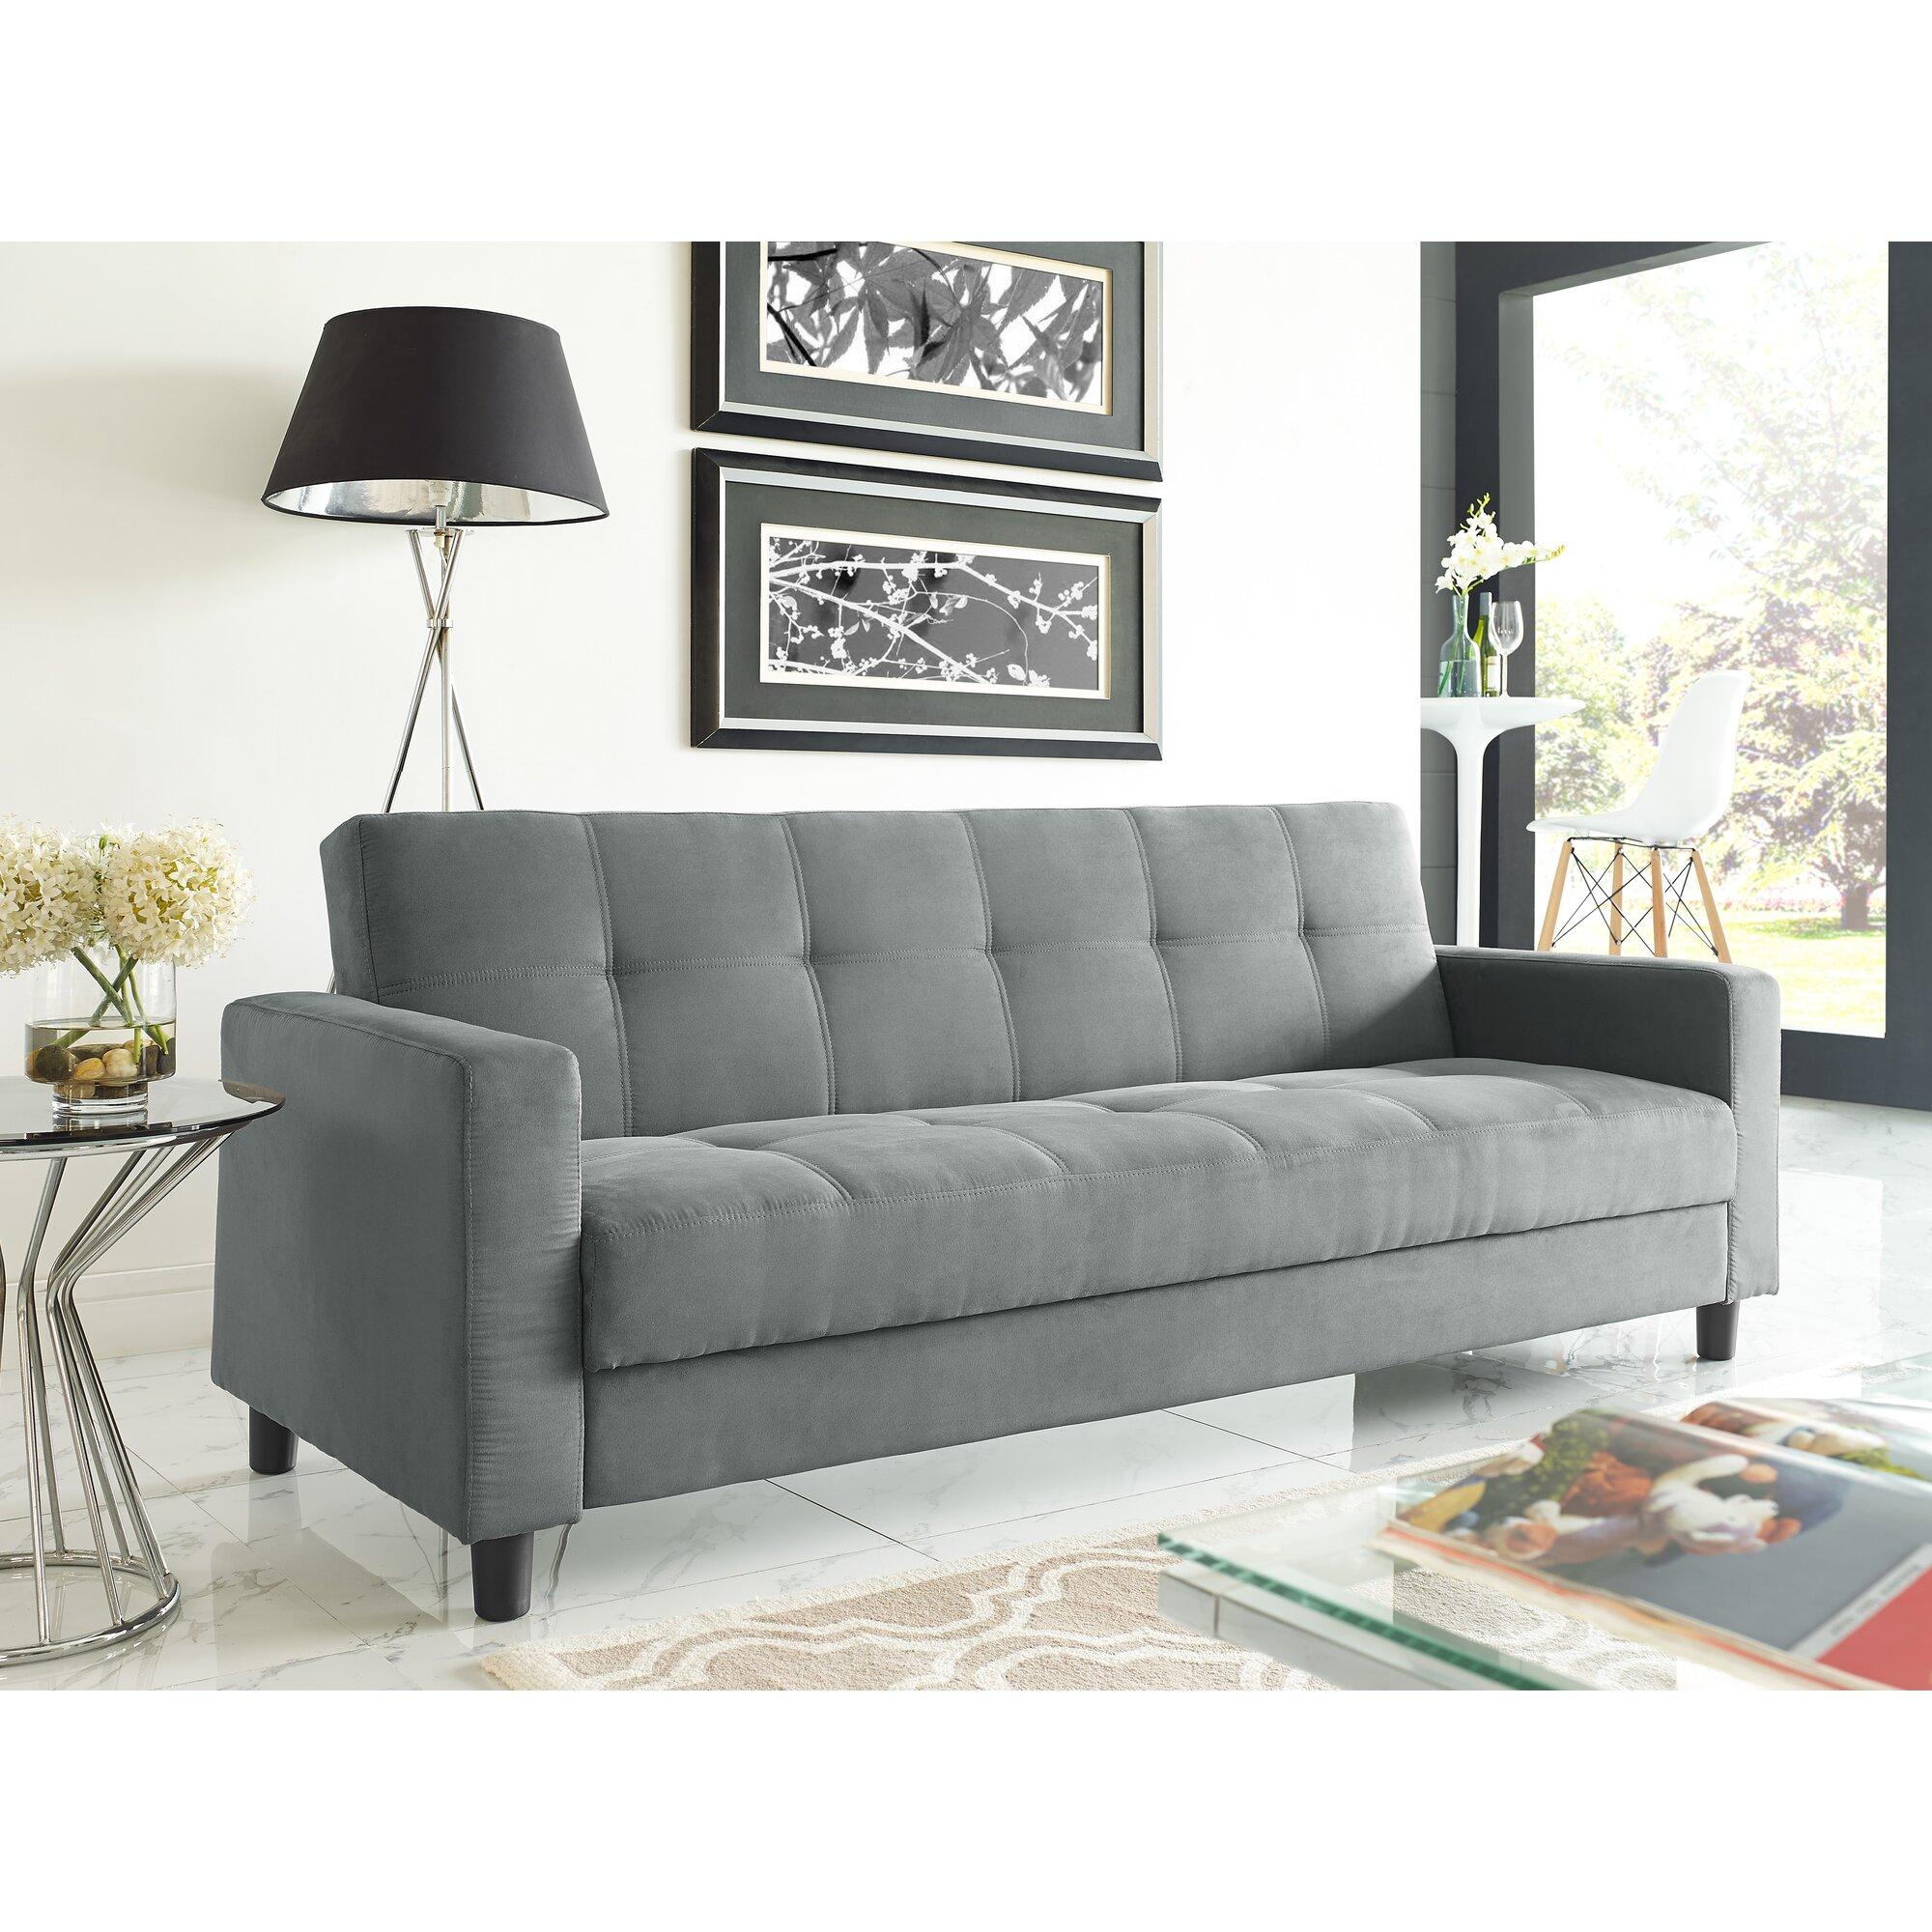 Serta Valerie Convertible Sofa Reviews